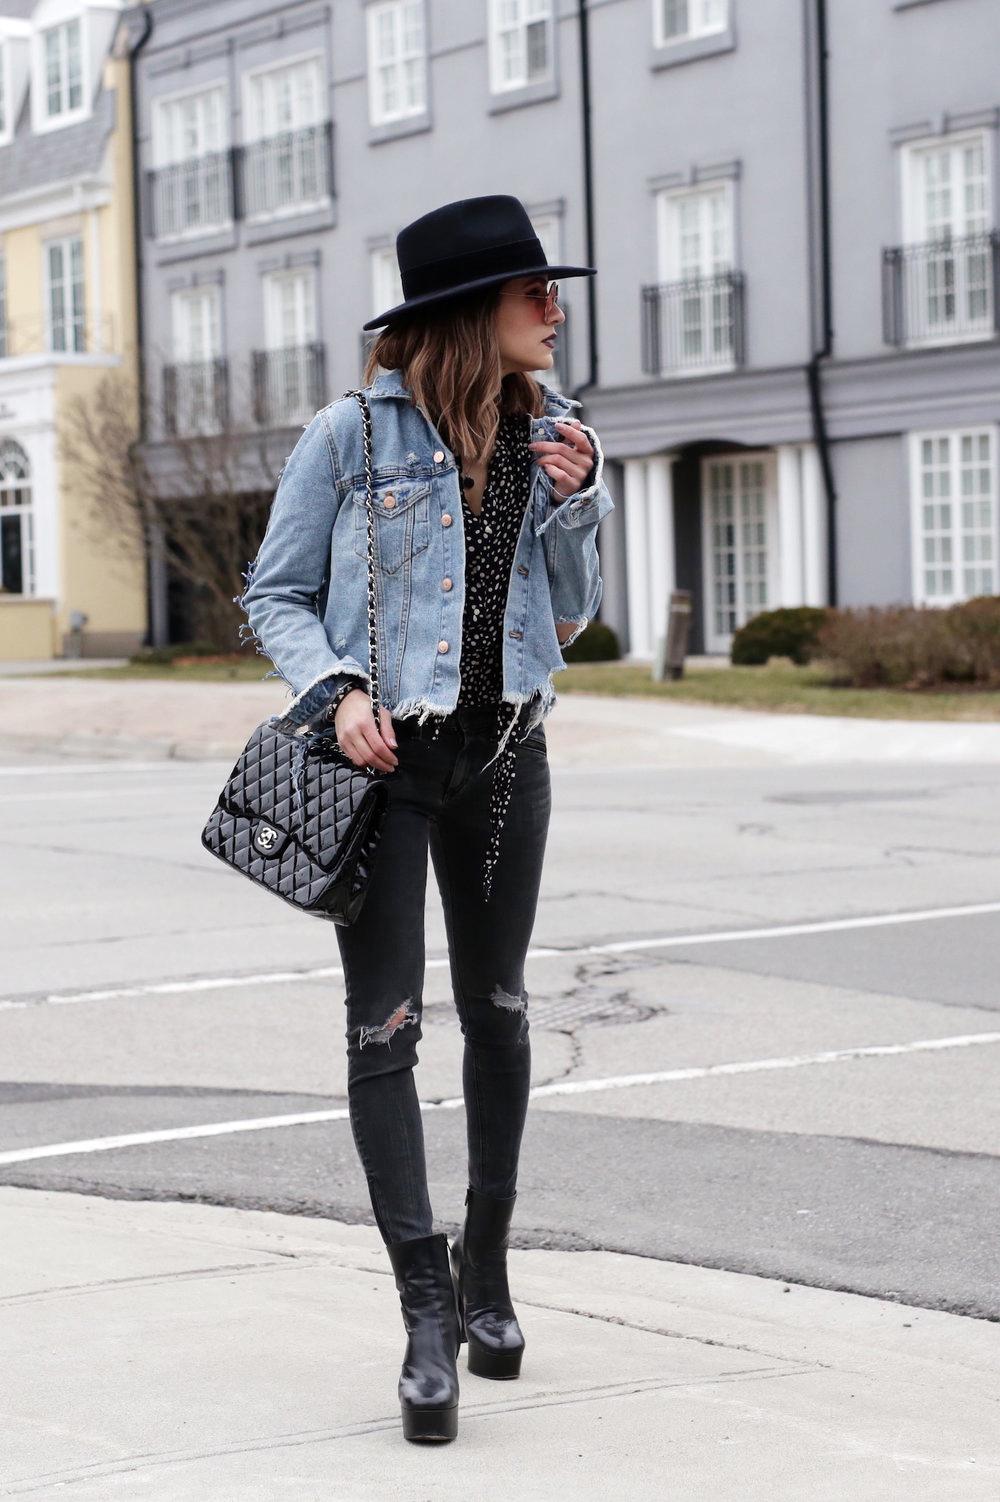 saint laurent platform boots - rag and bone jeans - ripped denim jacket - street style - woahstyle.com - nathalie martin-9.jpg